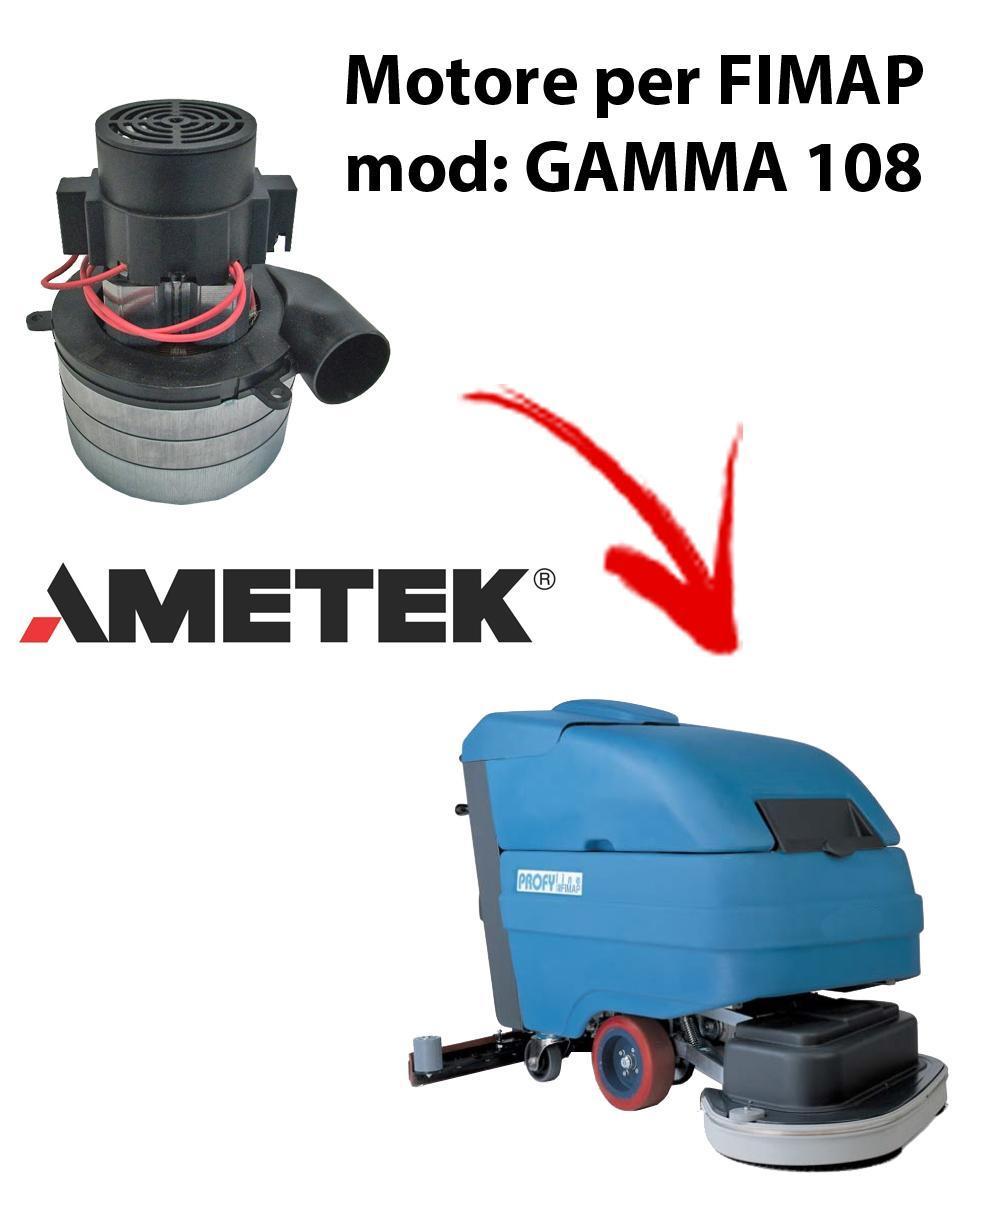 GAMMA 108 Vacuum motors AMETEK Italia for scrubber dryer FIMAP